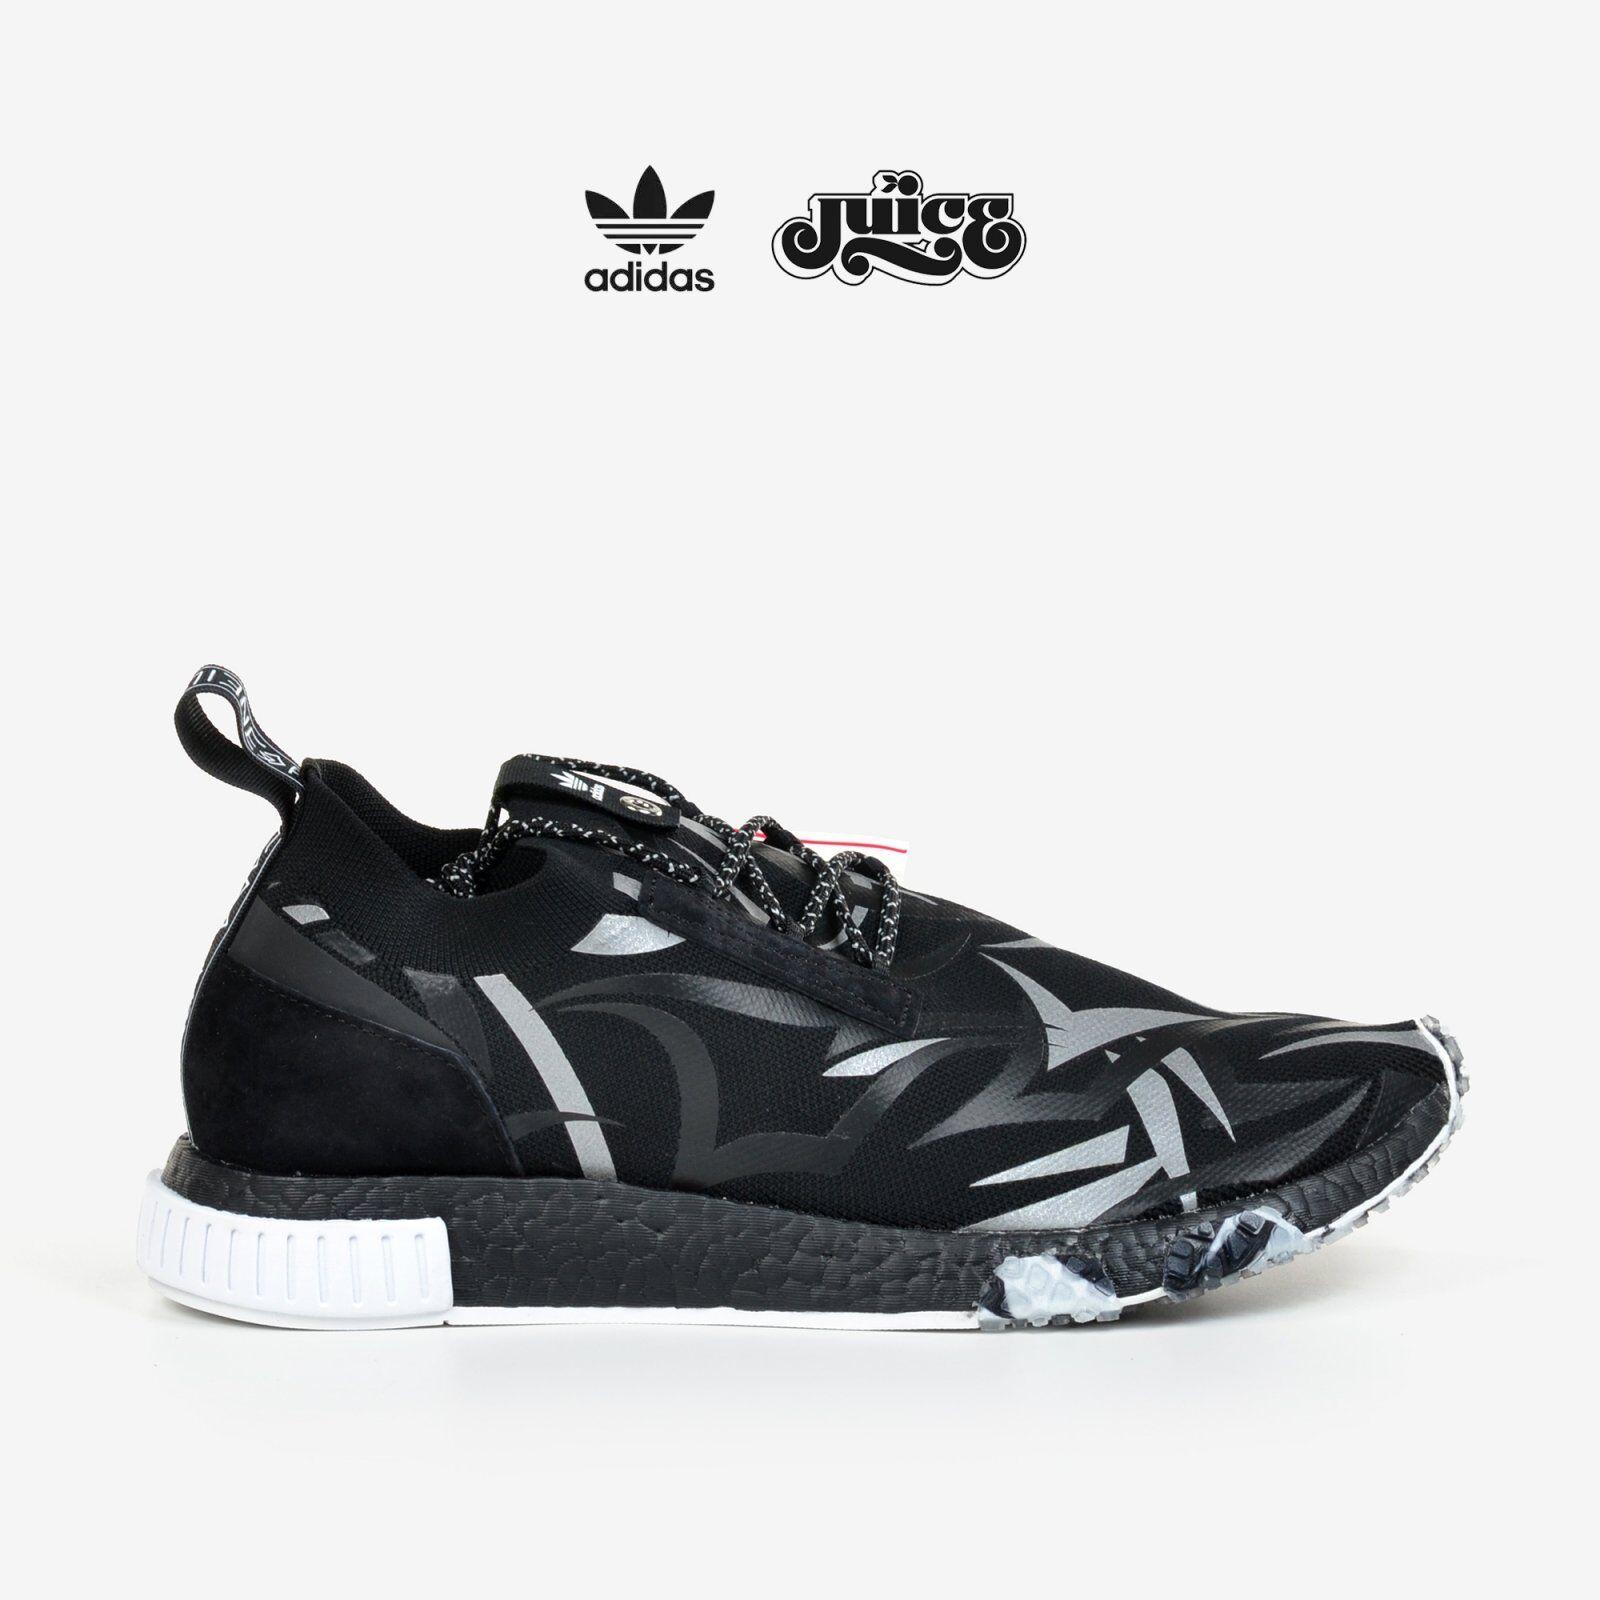 Adidas Consortium X Juice NMD Racer Alienegra bianca nero with scarpe Bag DB1777